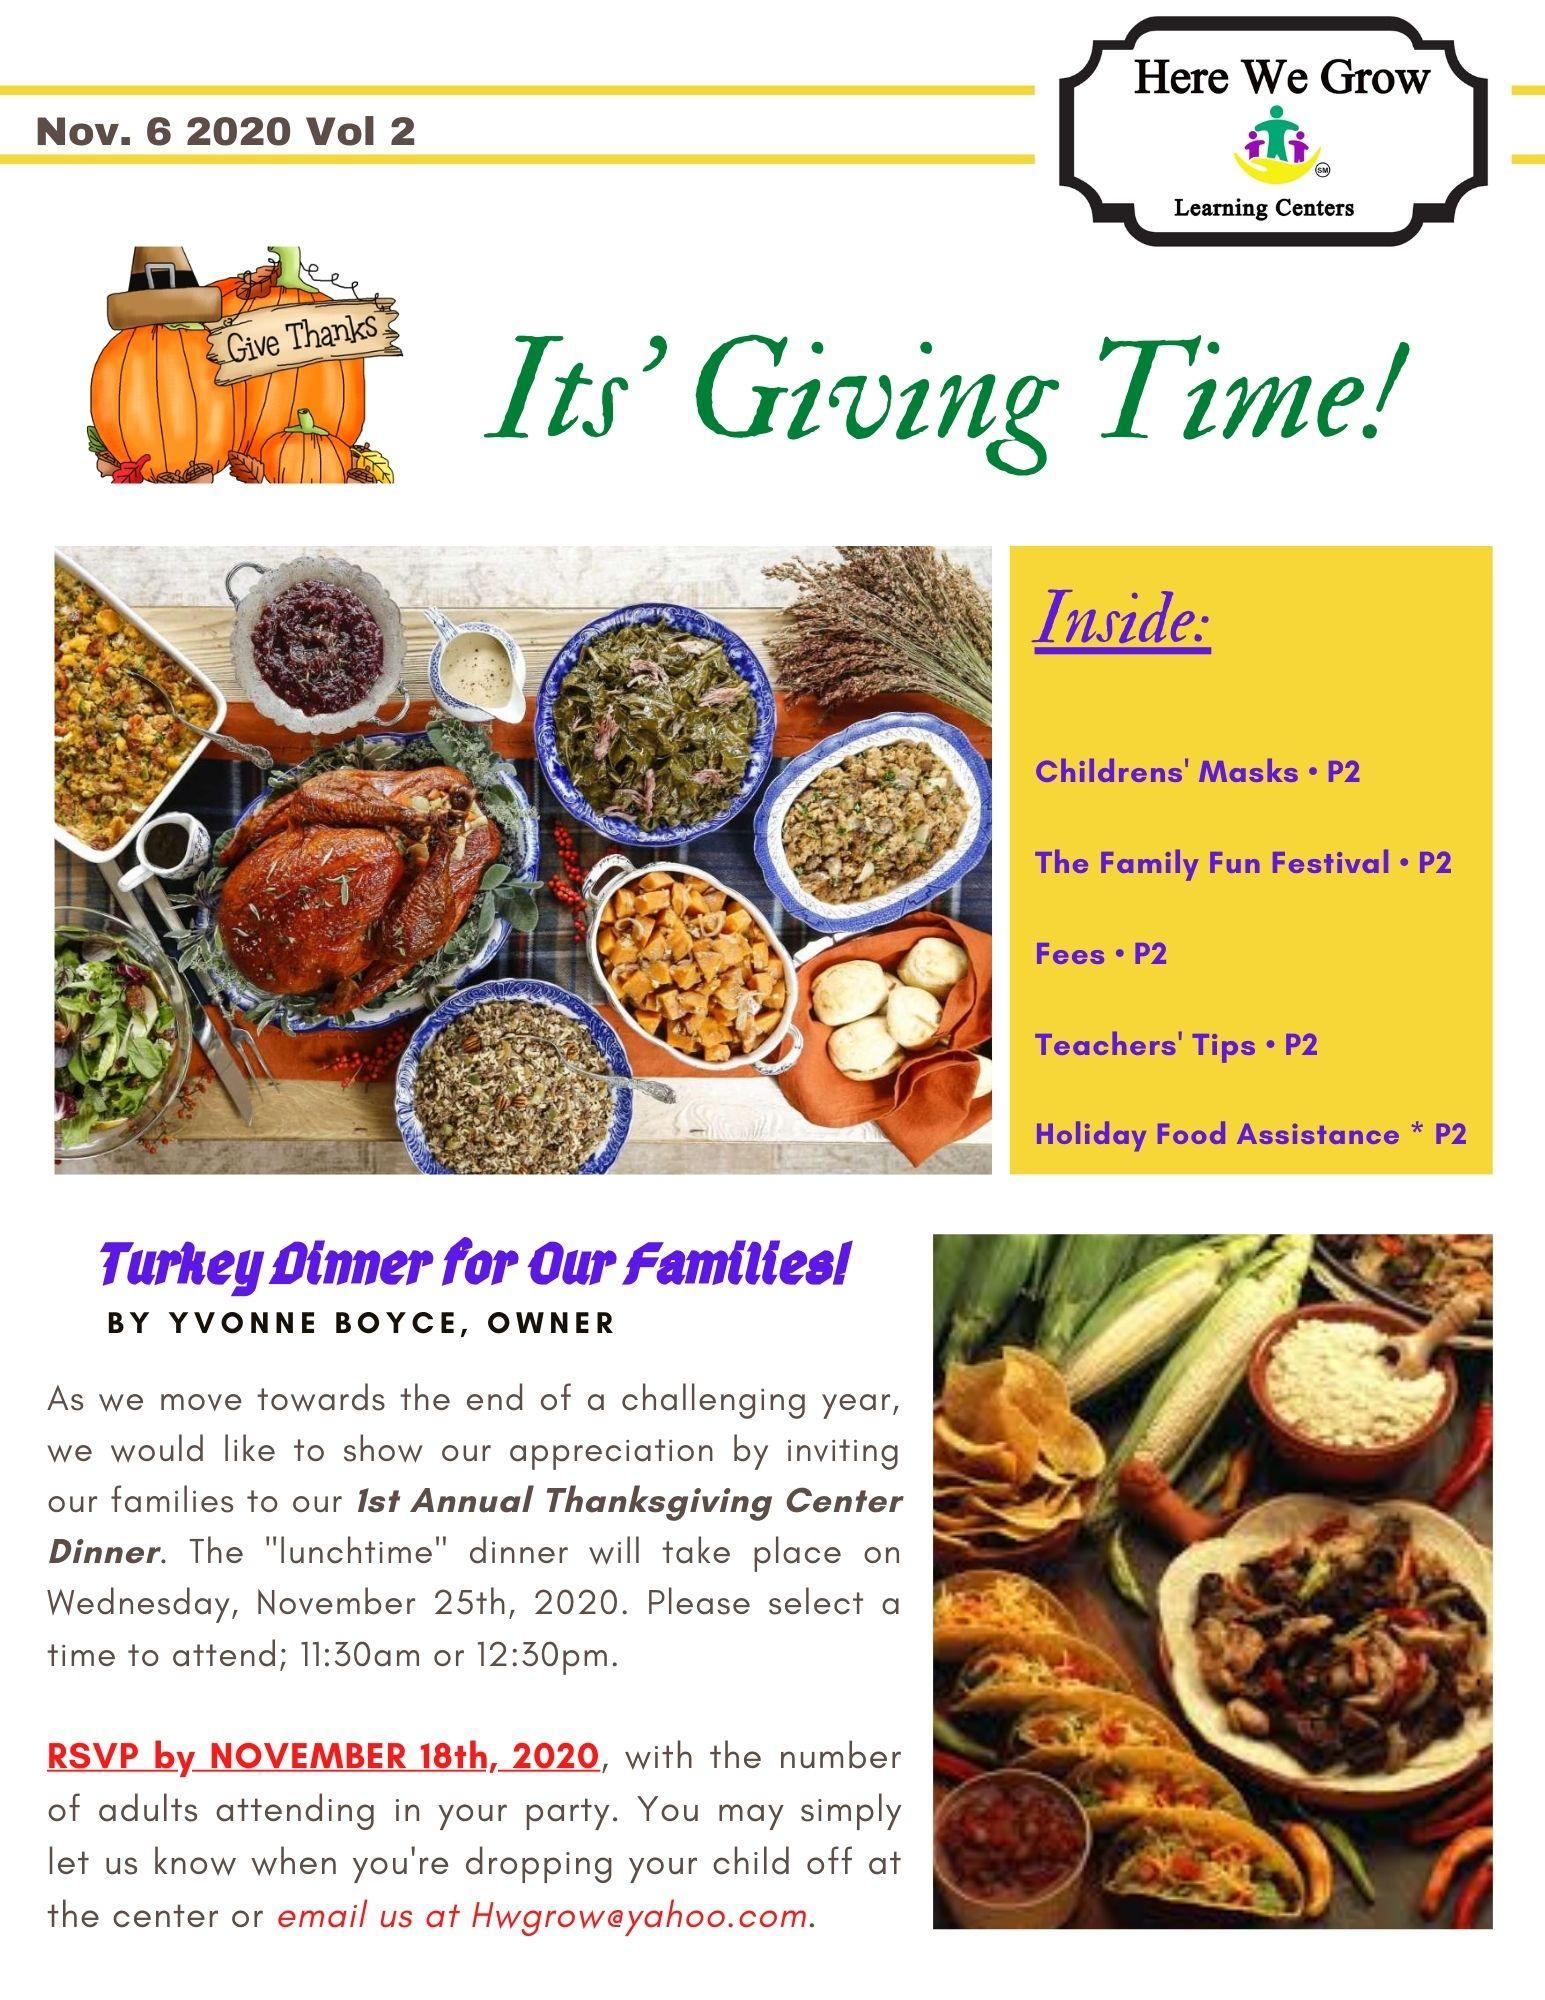 HWG Vol II Nov 2020 Thanksgiving Newslet